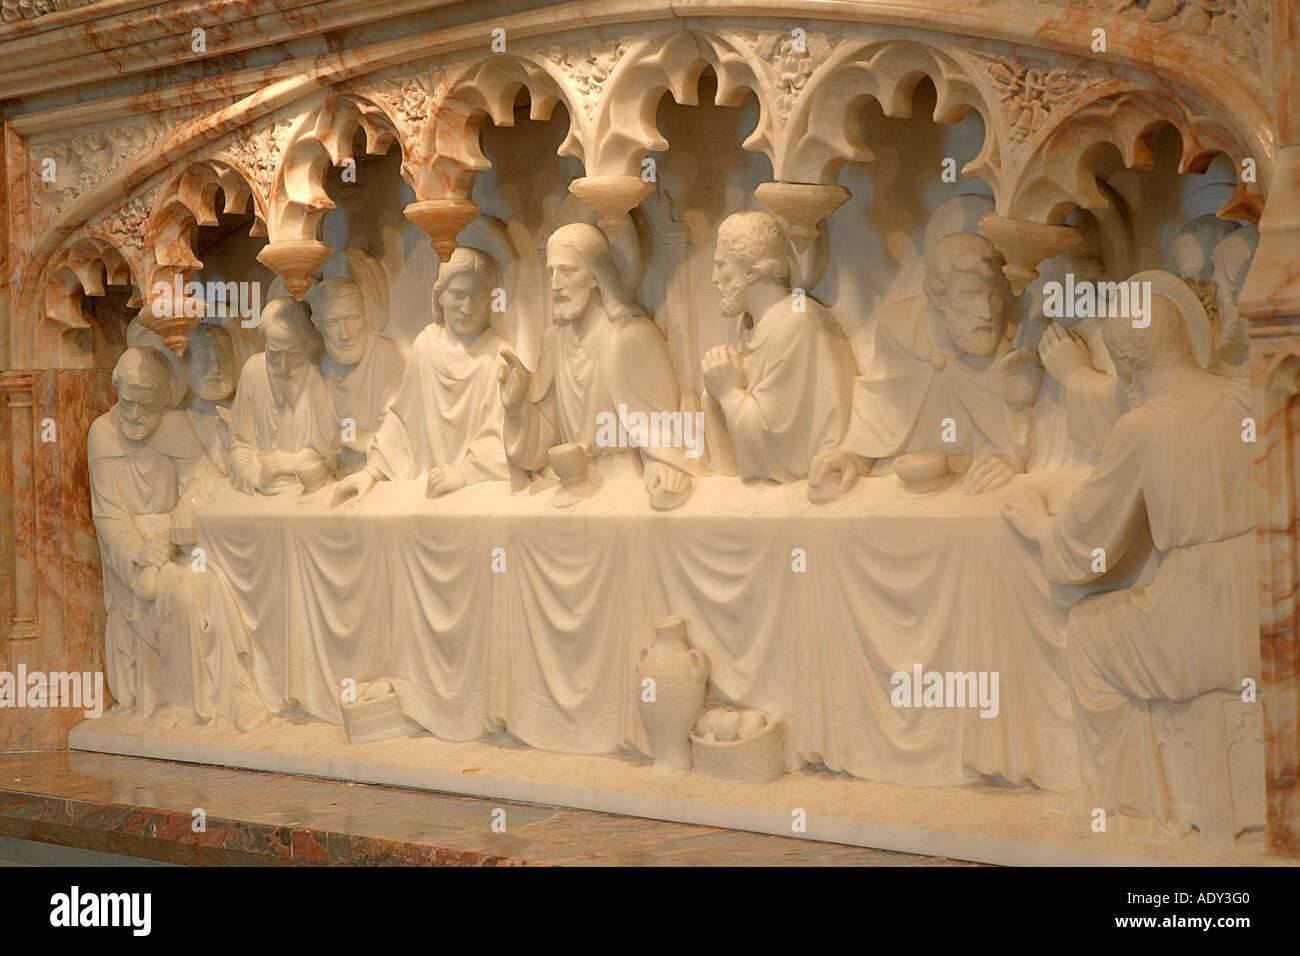 Enchanting Last Supper Sculpture Wall Art Adornment - Wall Art ...